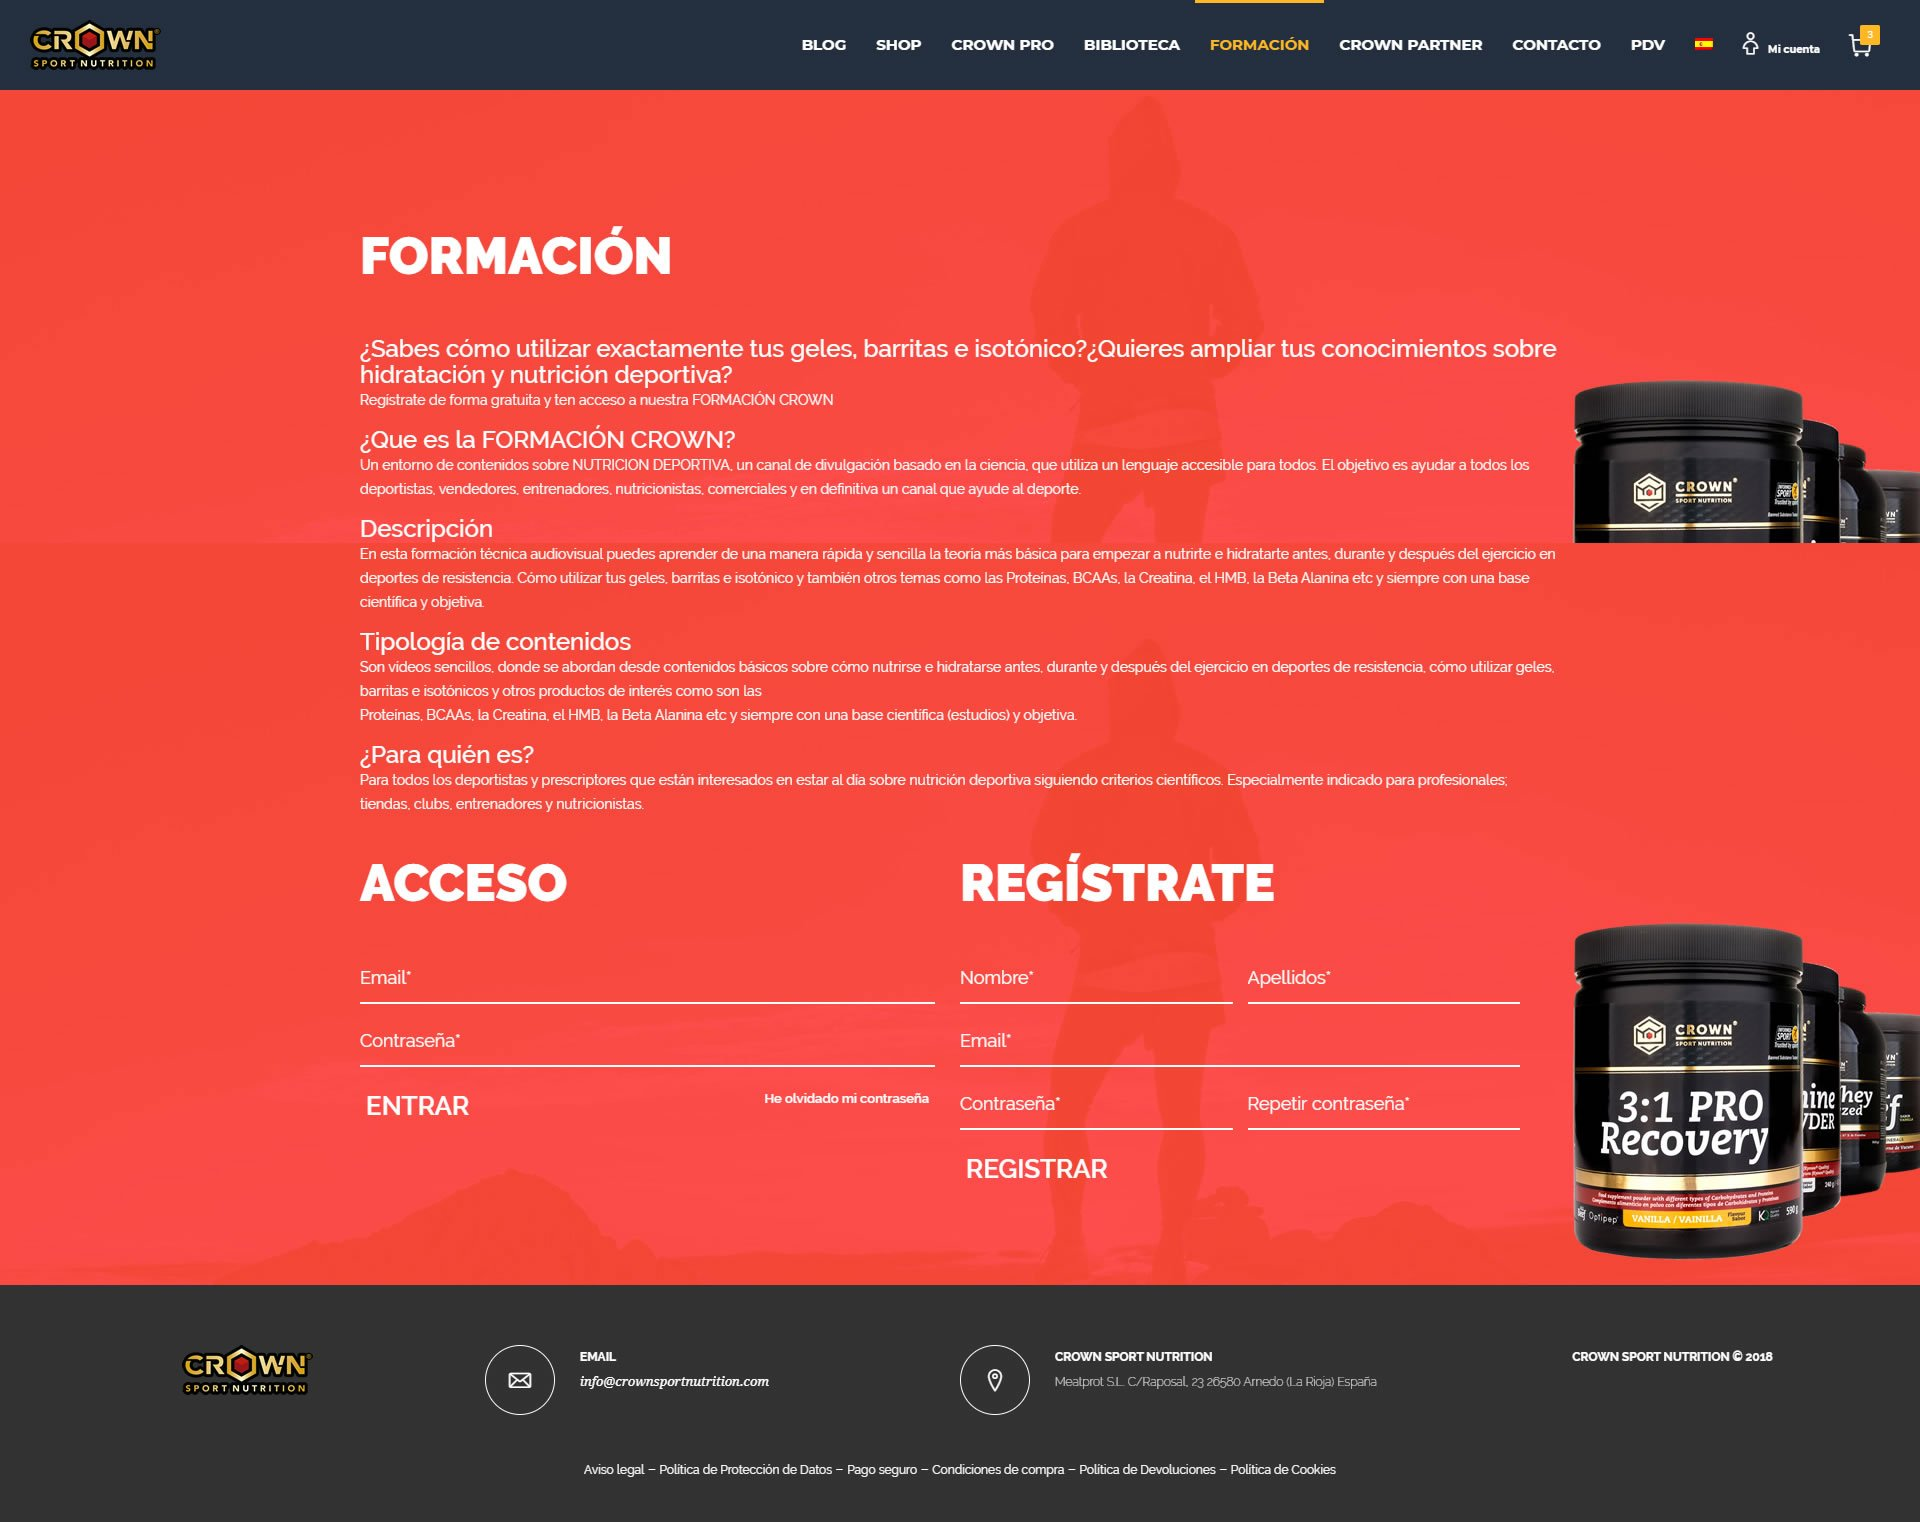 Diseñador web - CrownSportNutrition